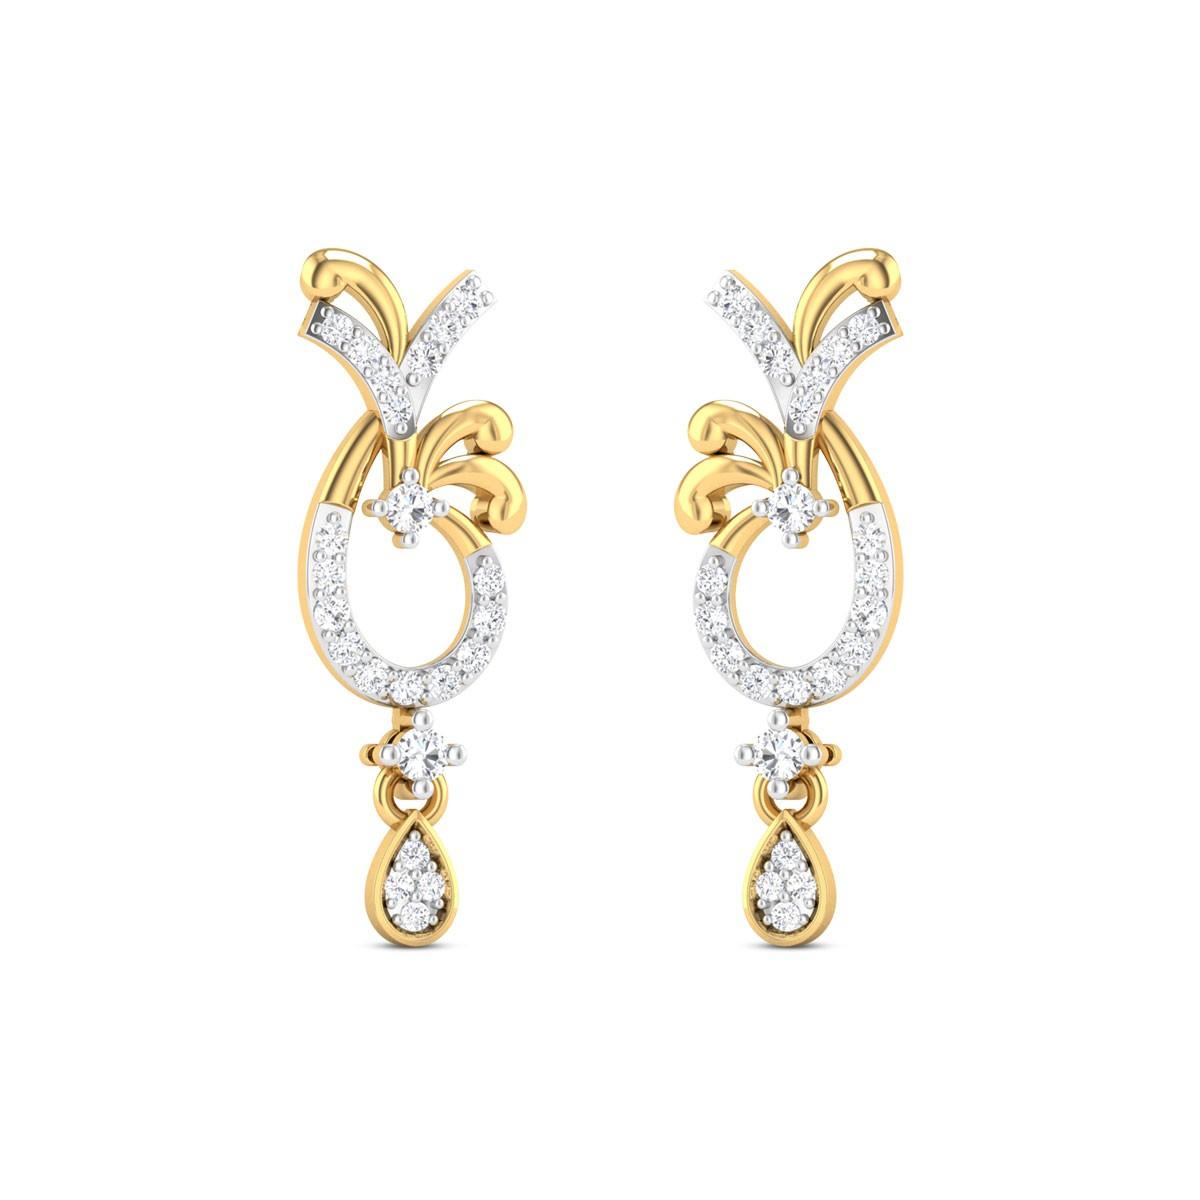 Iris Diamond Earrings